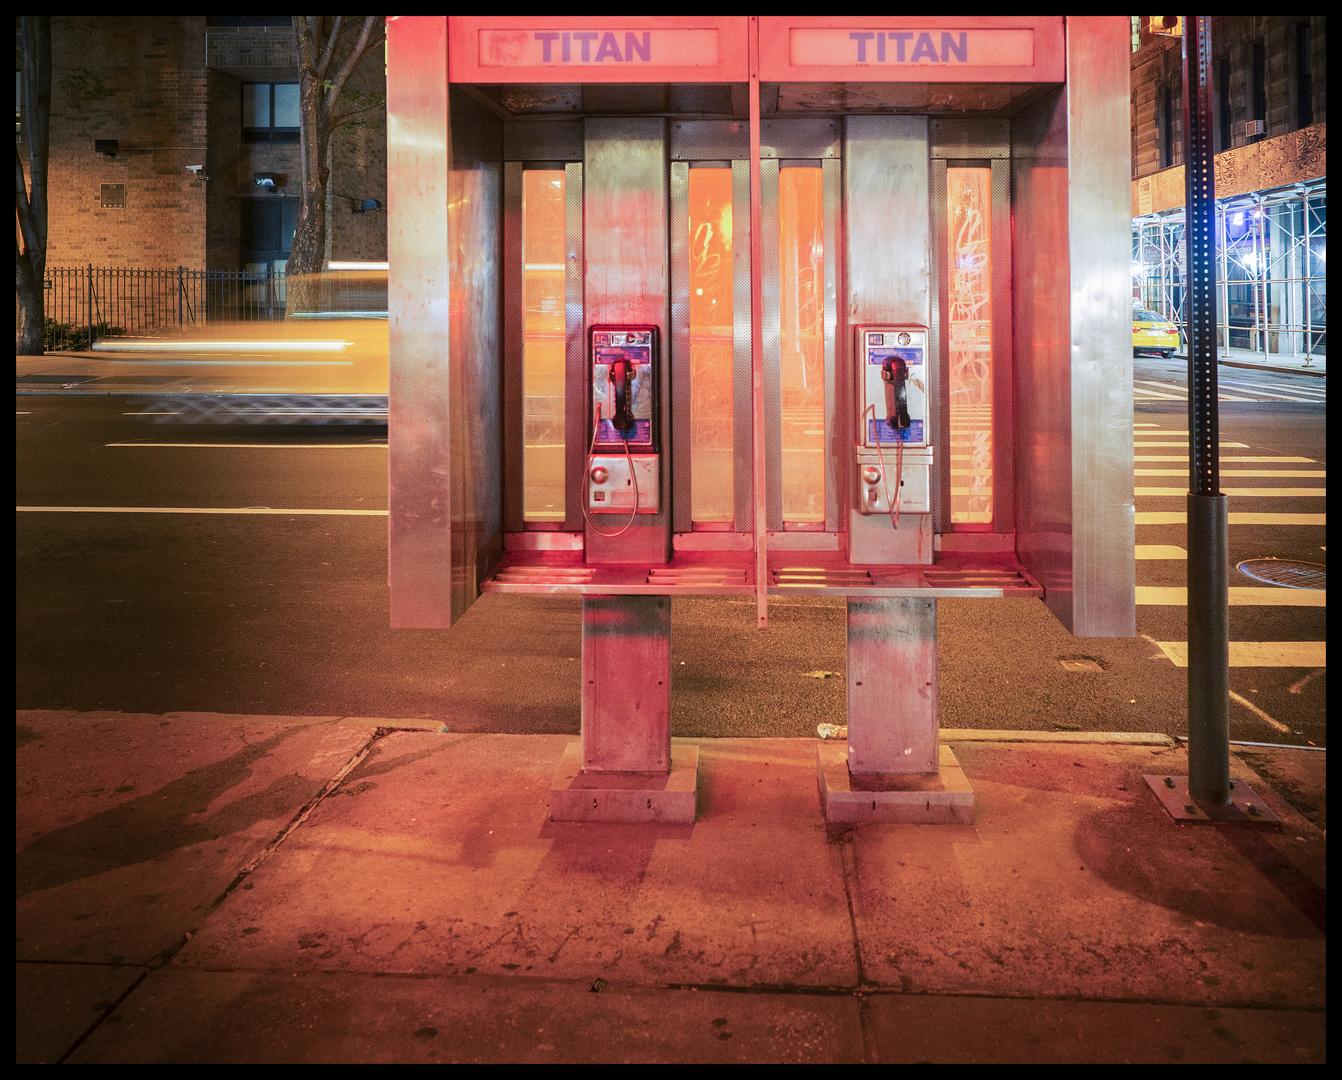 TITAN # 001 - NYC Juni 2017